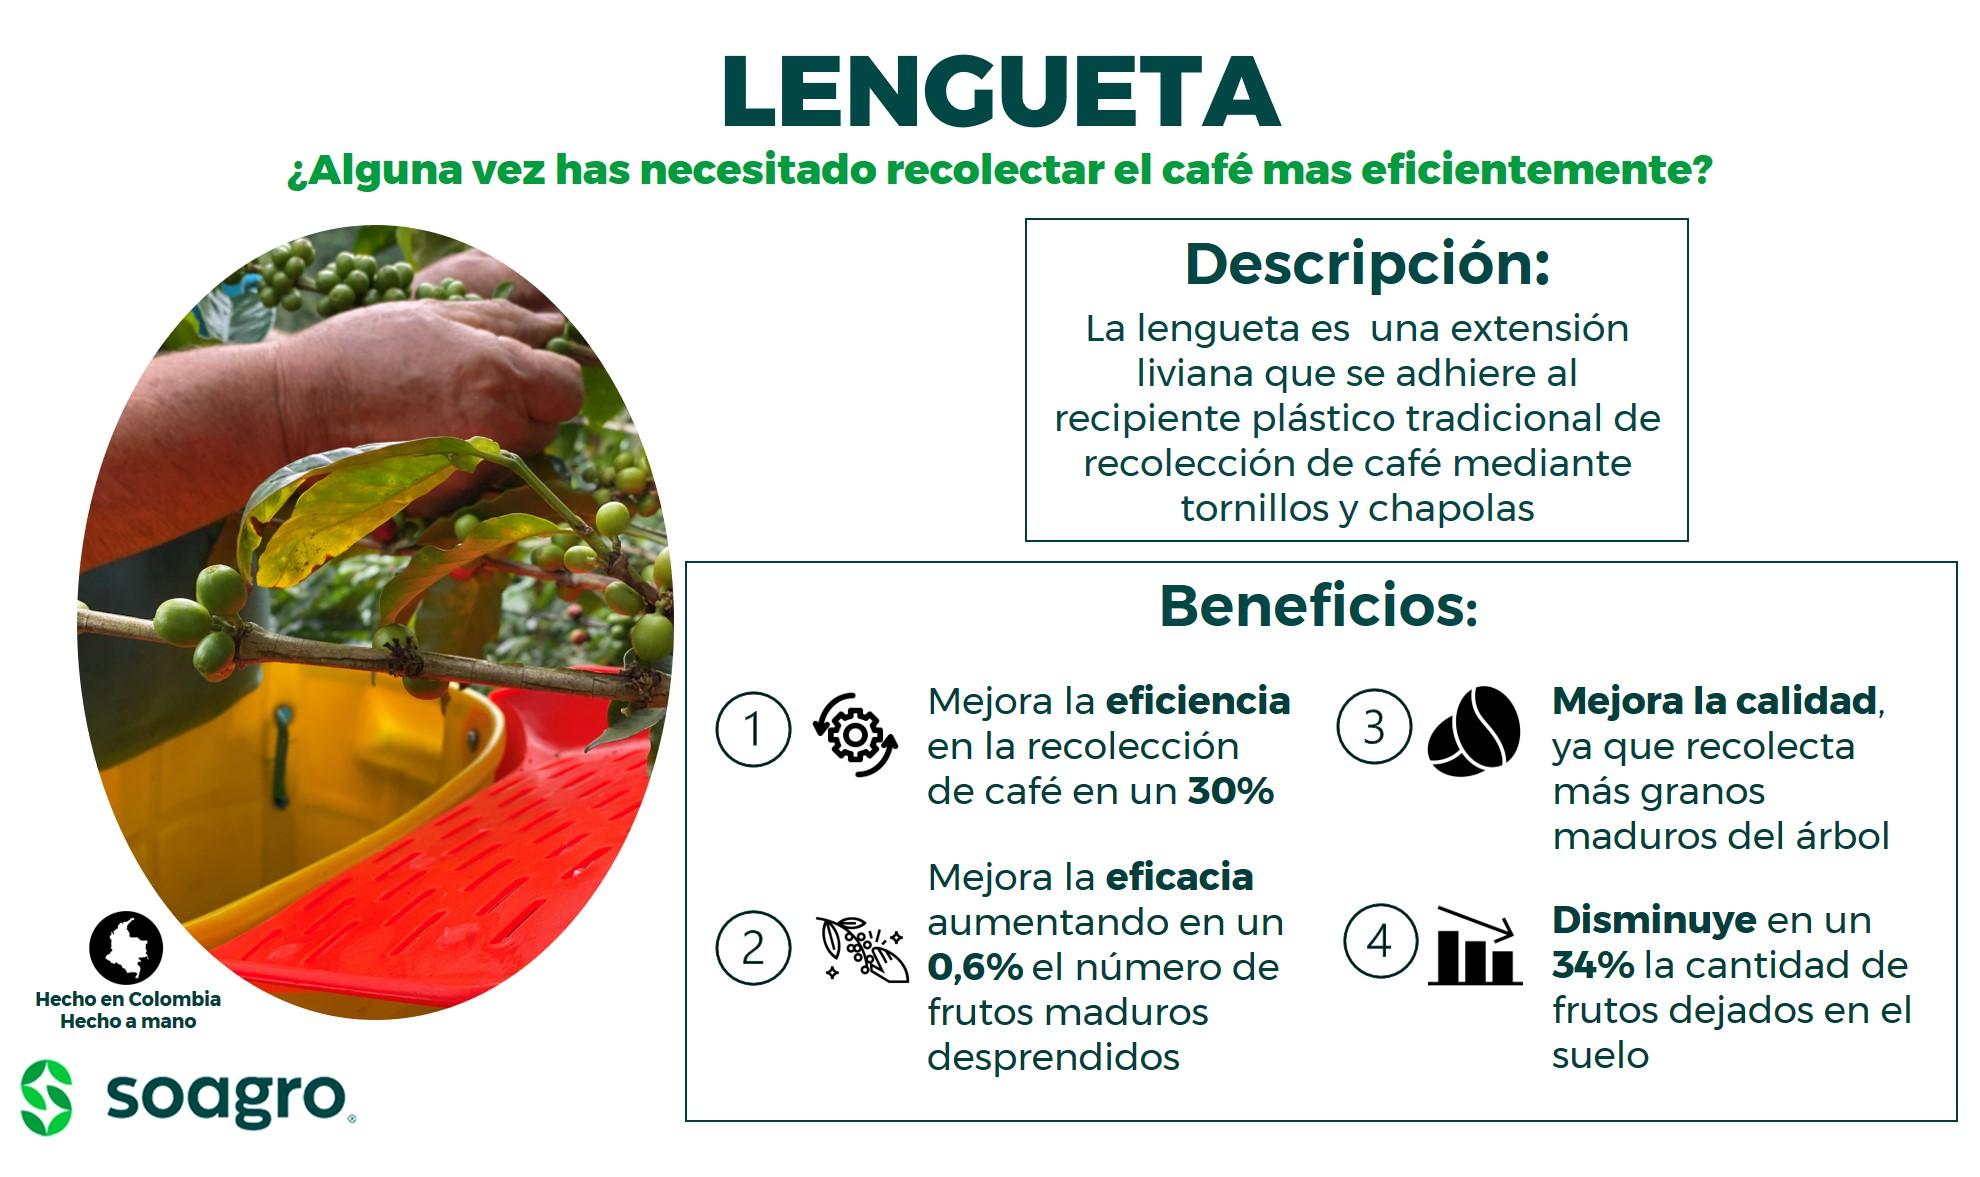 Lengueta_3.jpg